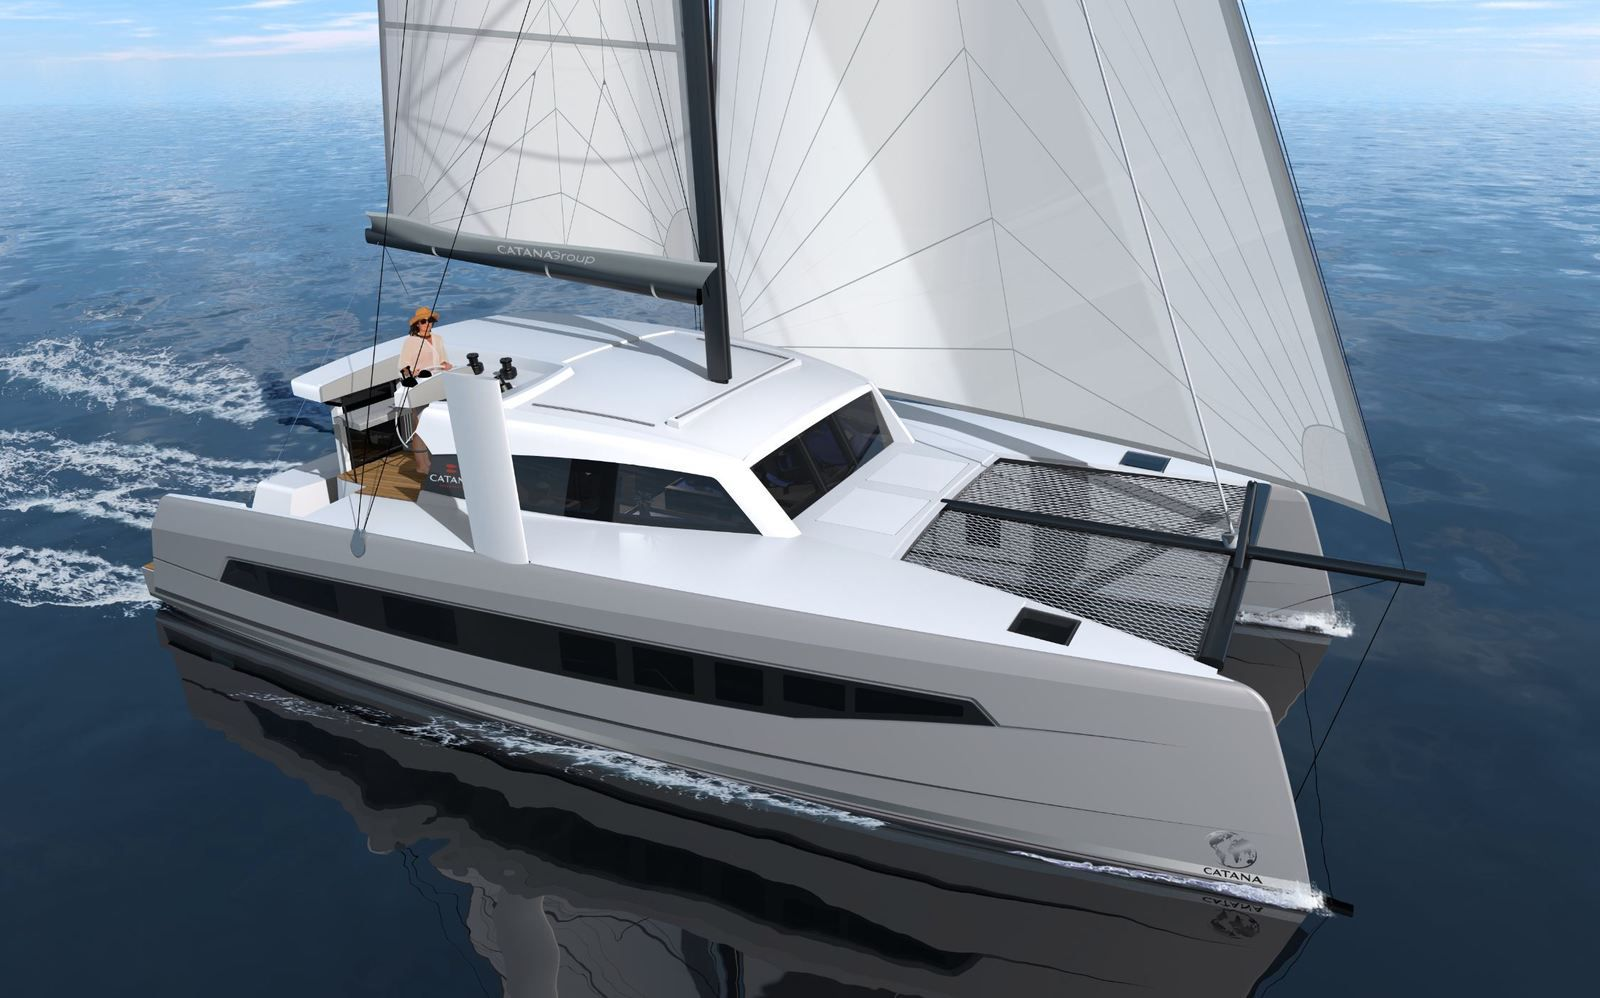 Catana Ocean Class - grand voyage et hautes performances... en mode Open !!